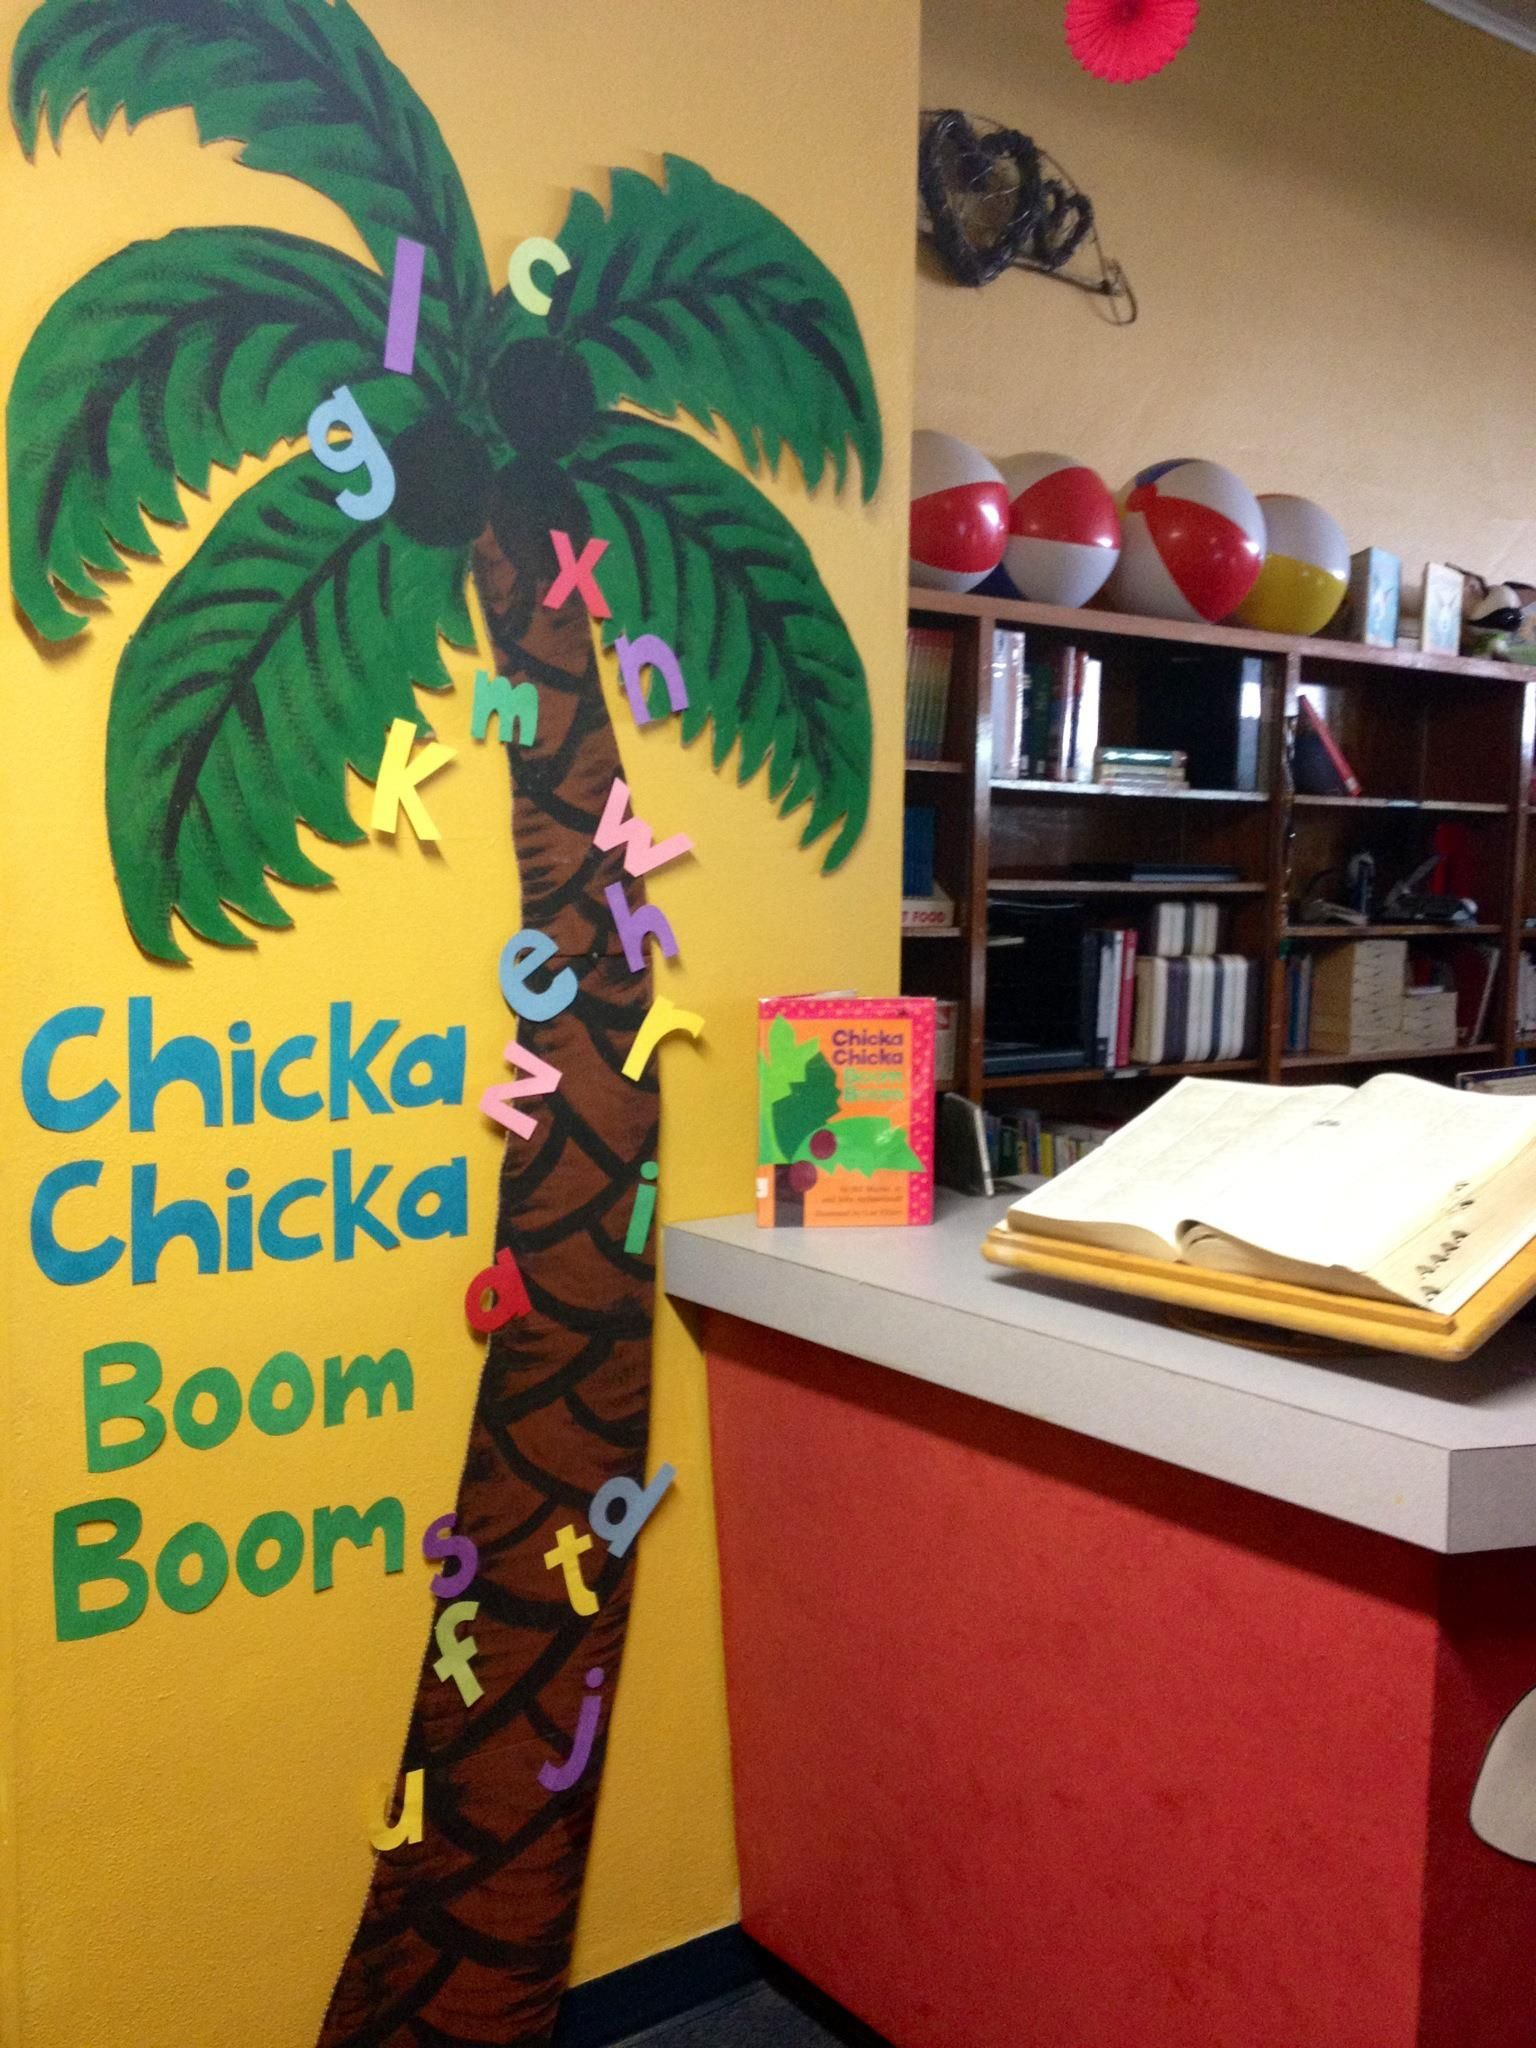 Chicka Chicka Boom Boom Tree Painted On Refrigerator Box